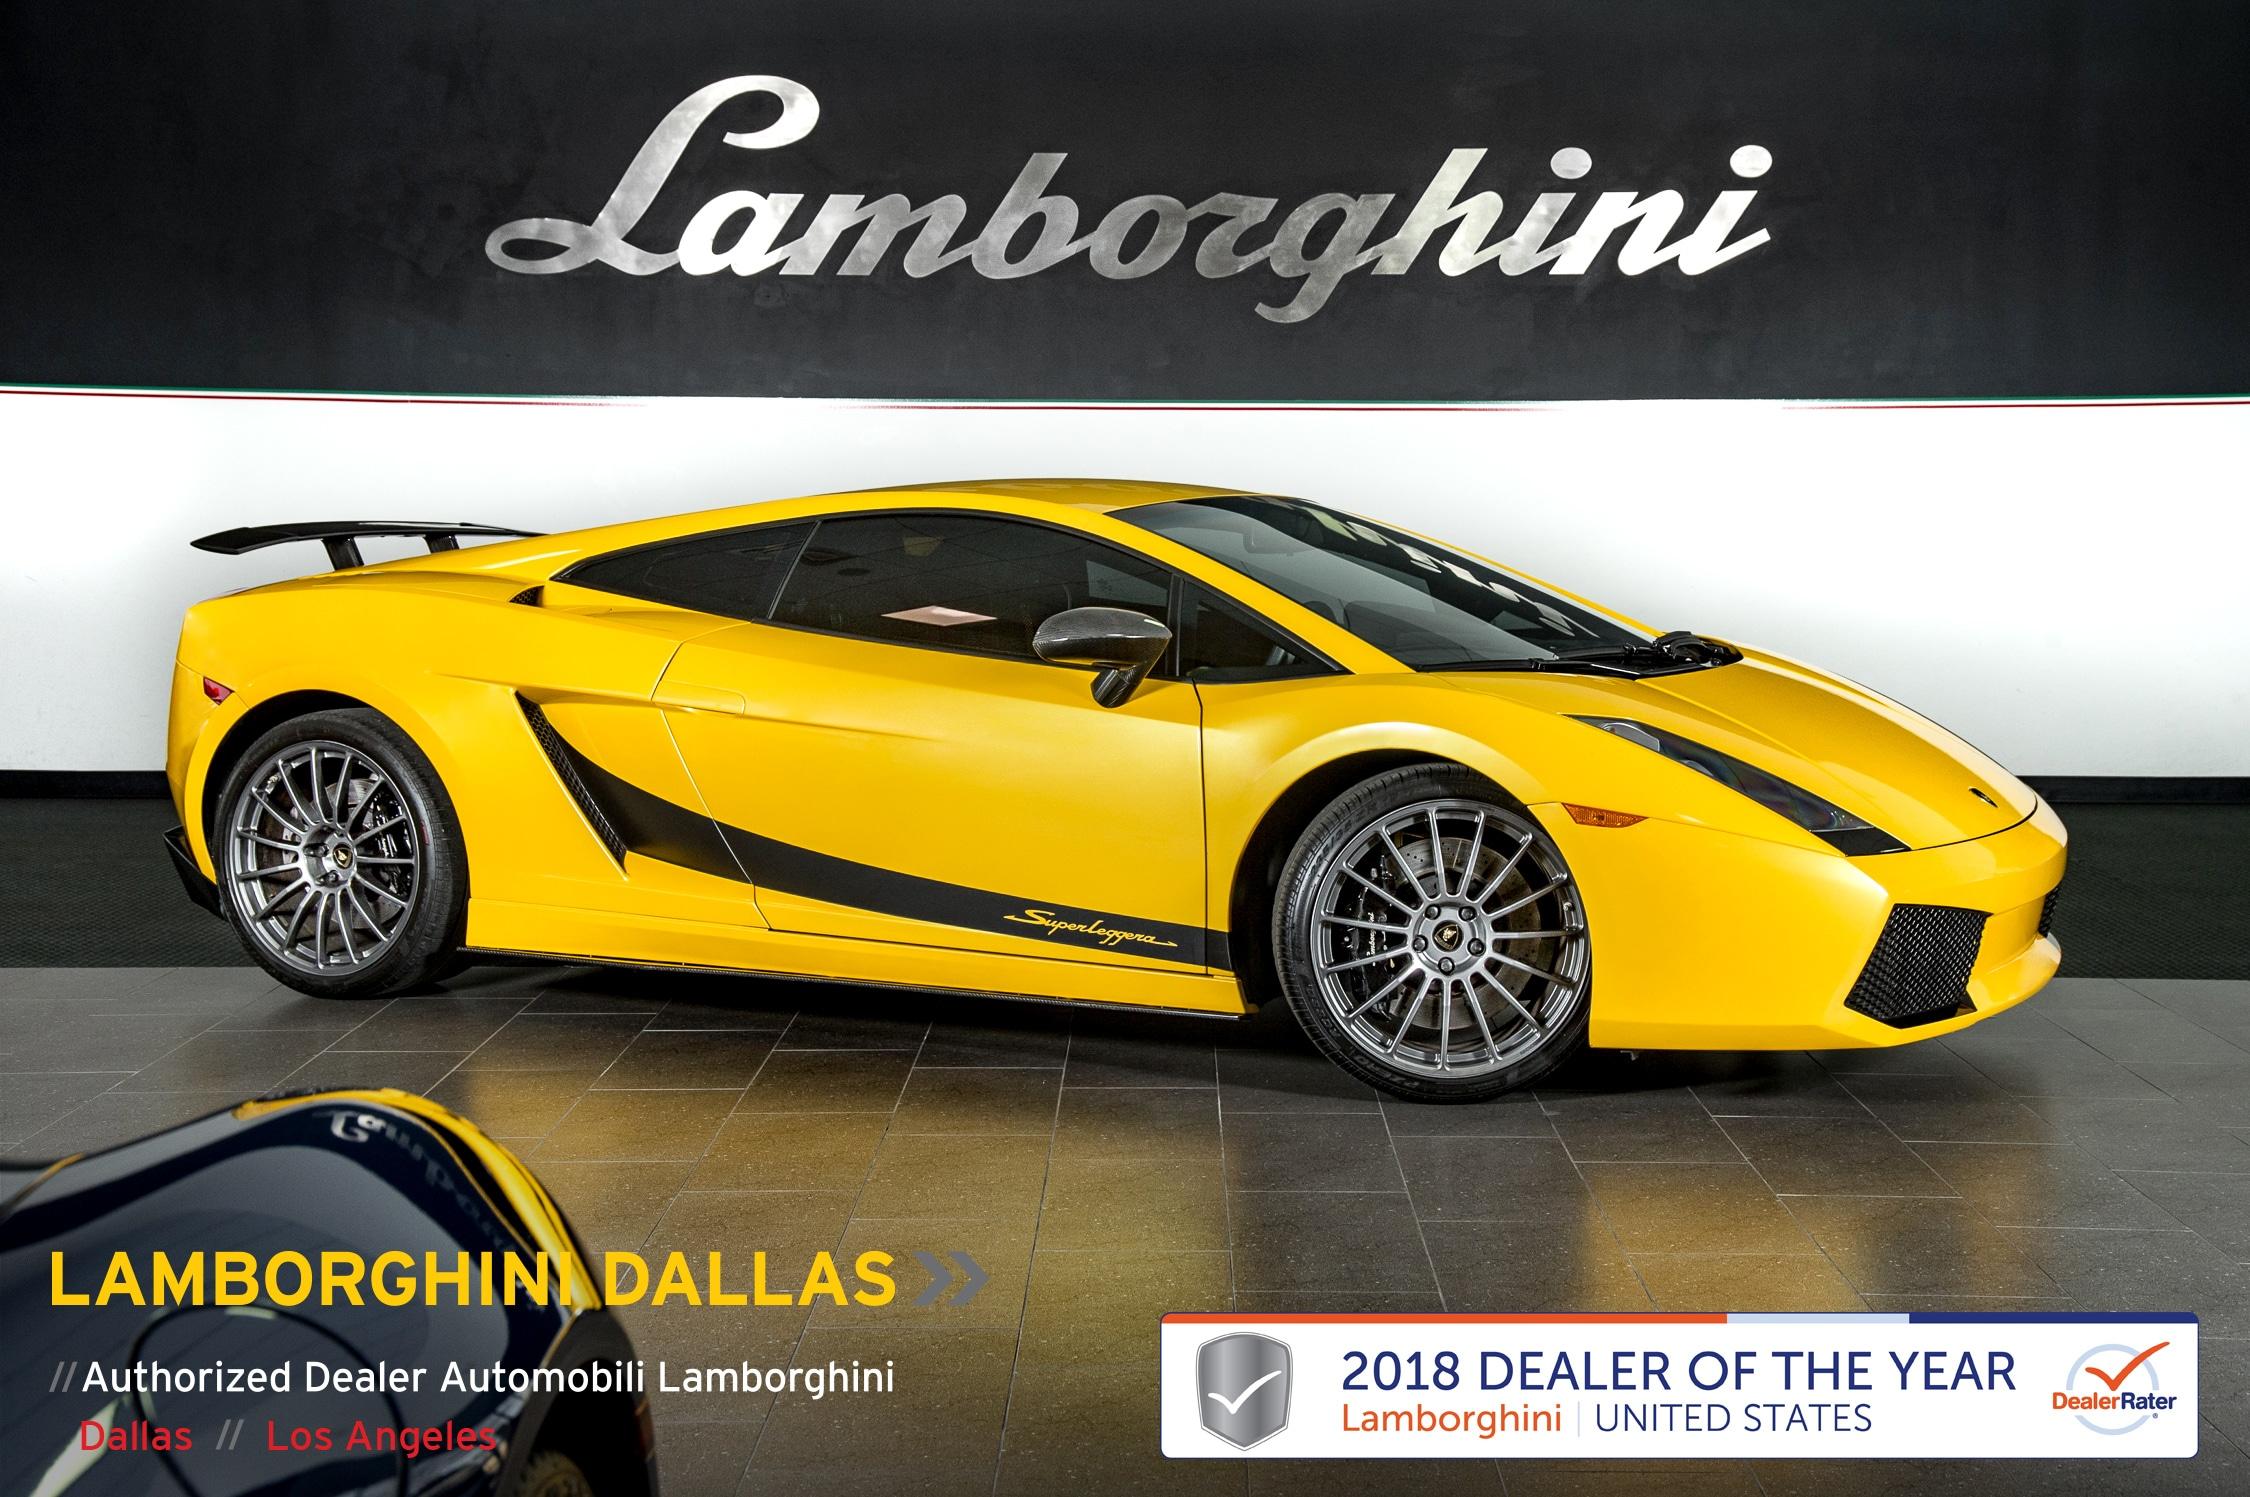 2008 Lamborghini Gallardo Superleggera Coupe